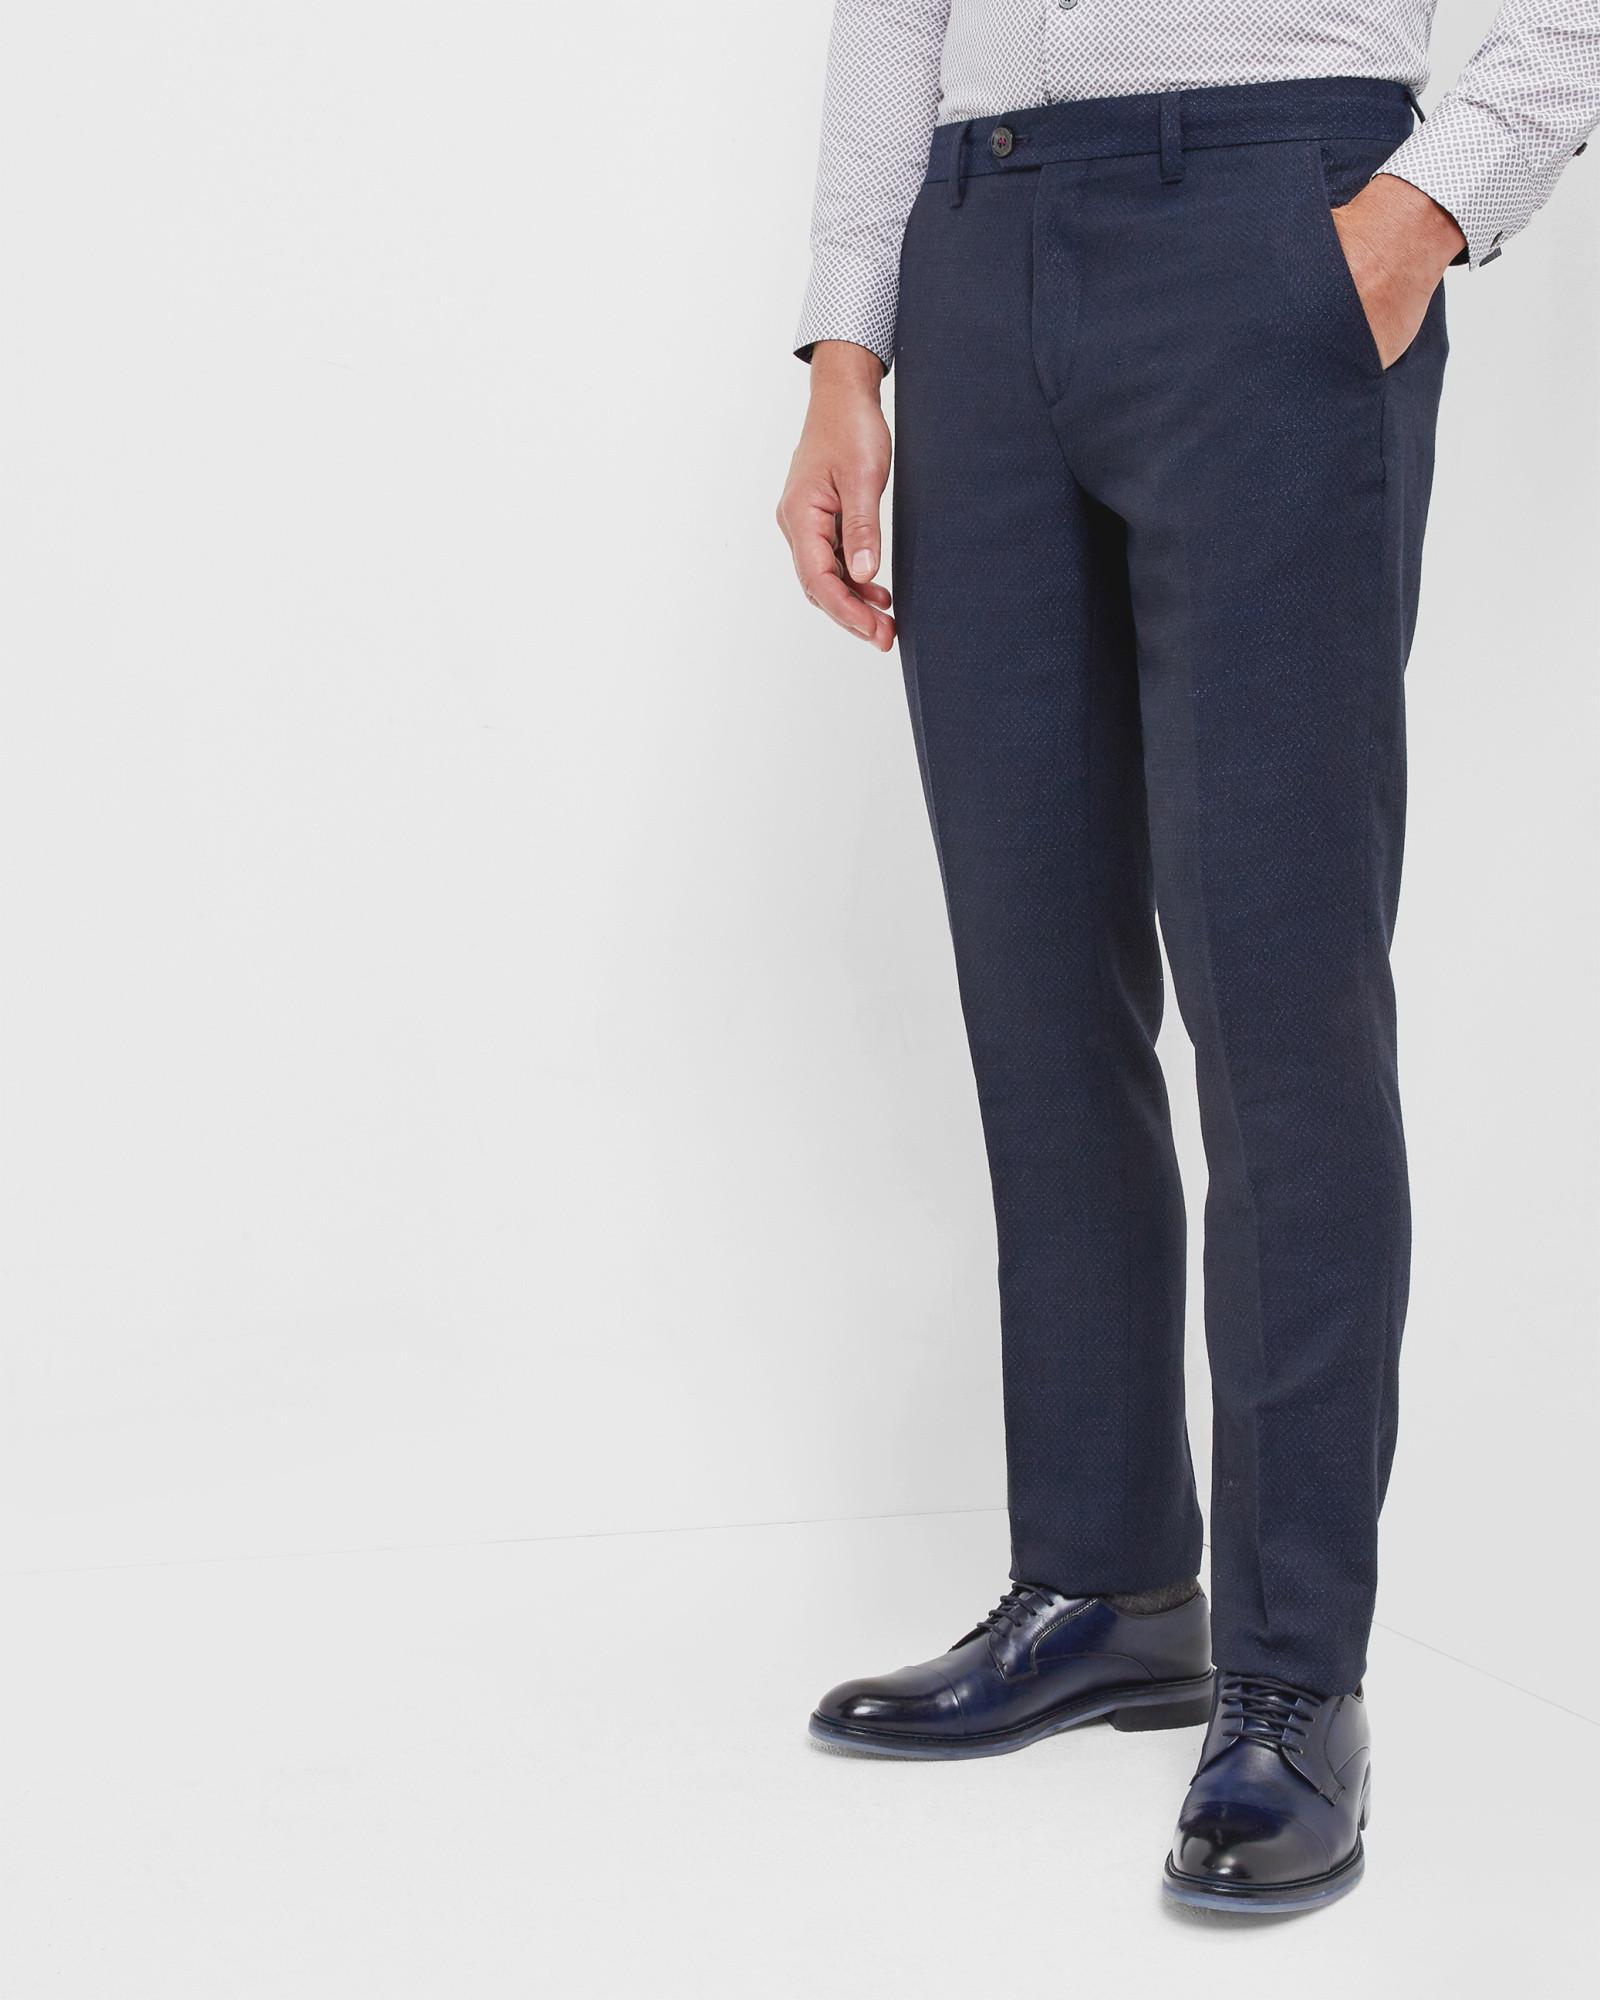 ddcf37ac5 Lyst - Ted Baker Linen Trousers in Blue for Men